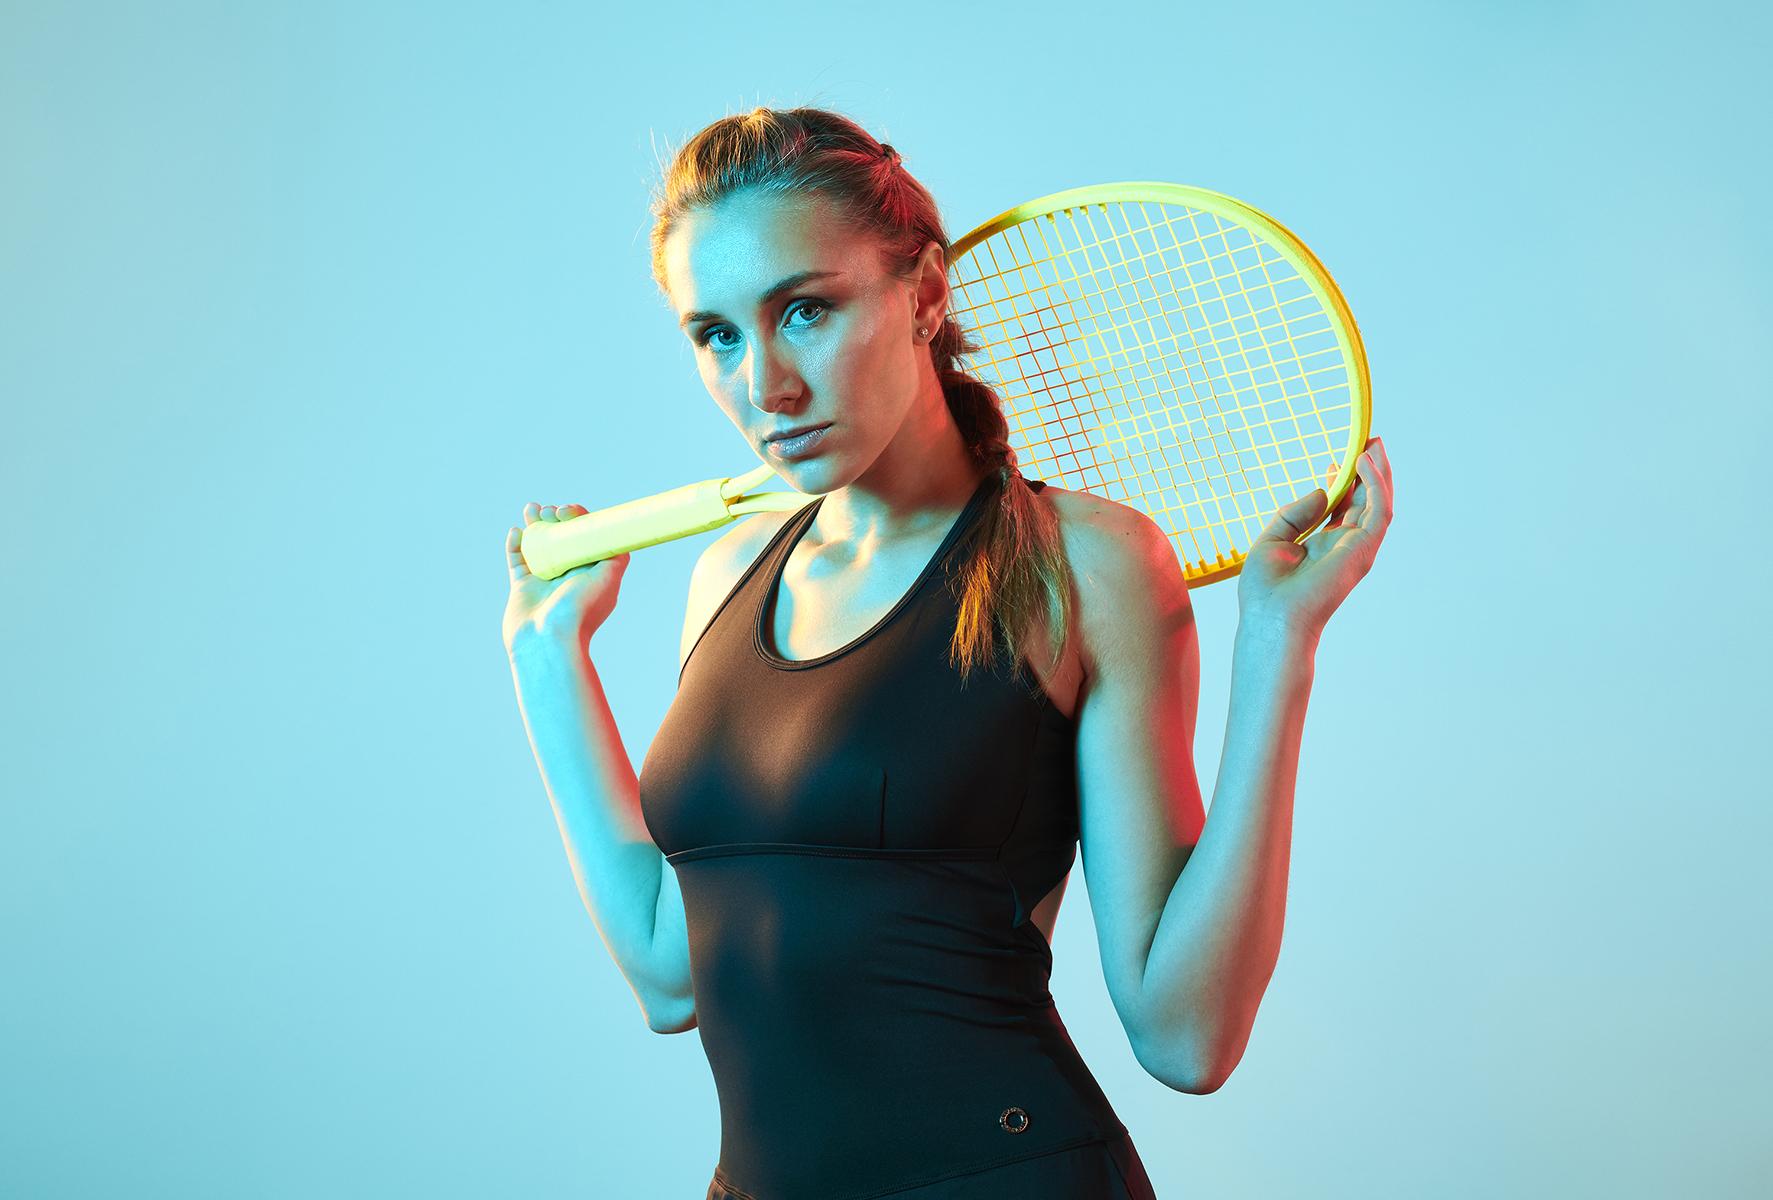 20181111_Tennis12070_FINAL_WEB.jpg